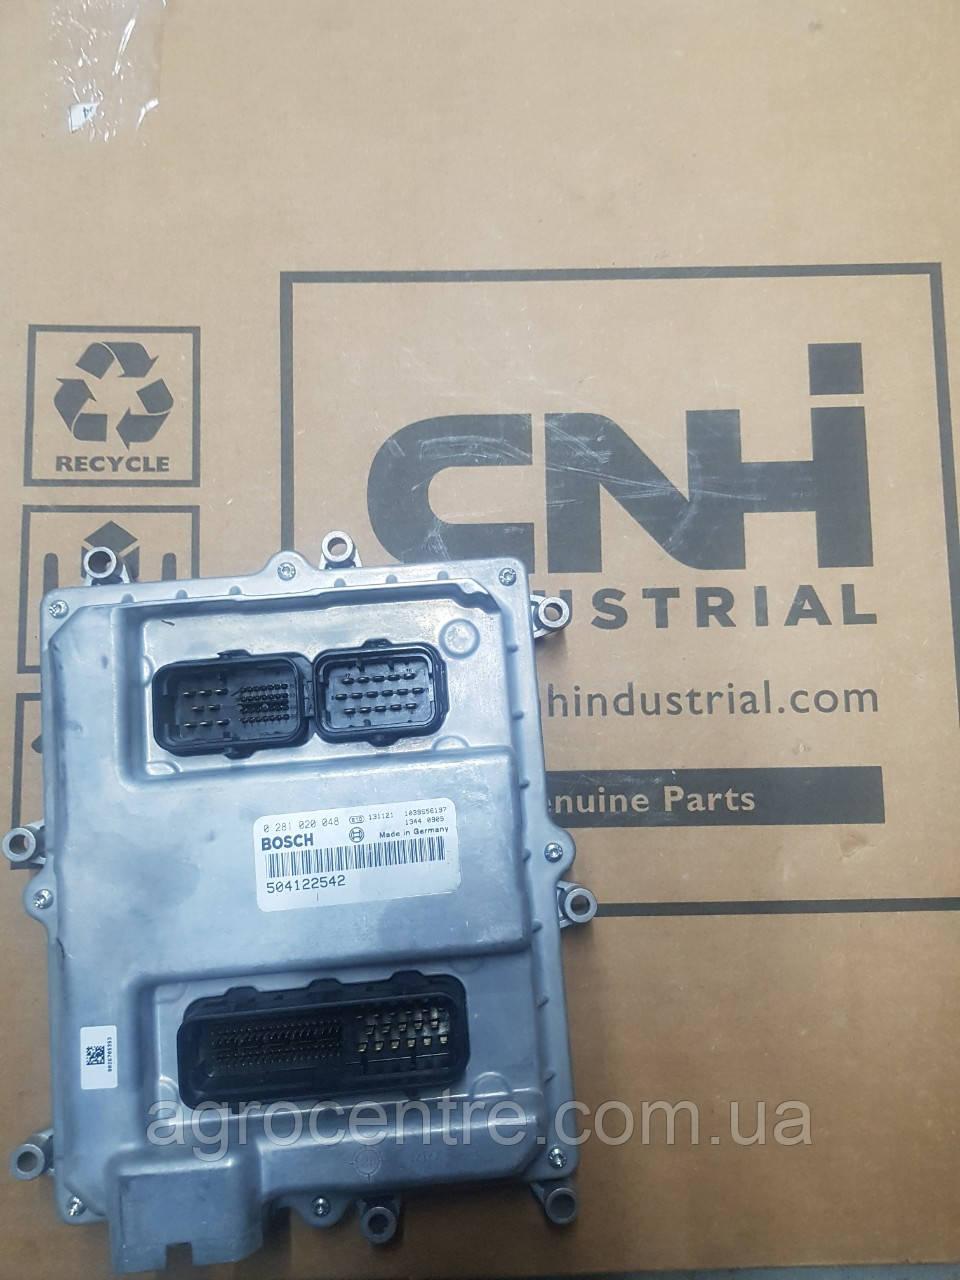 Модуль ДВС 2854594 CR9080, CR9060, CX8080, CSX7080, CS6090